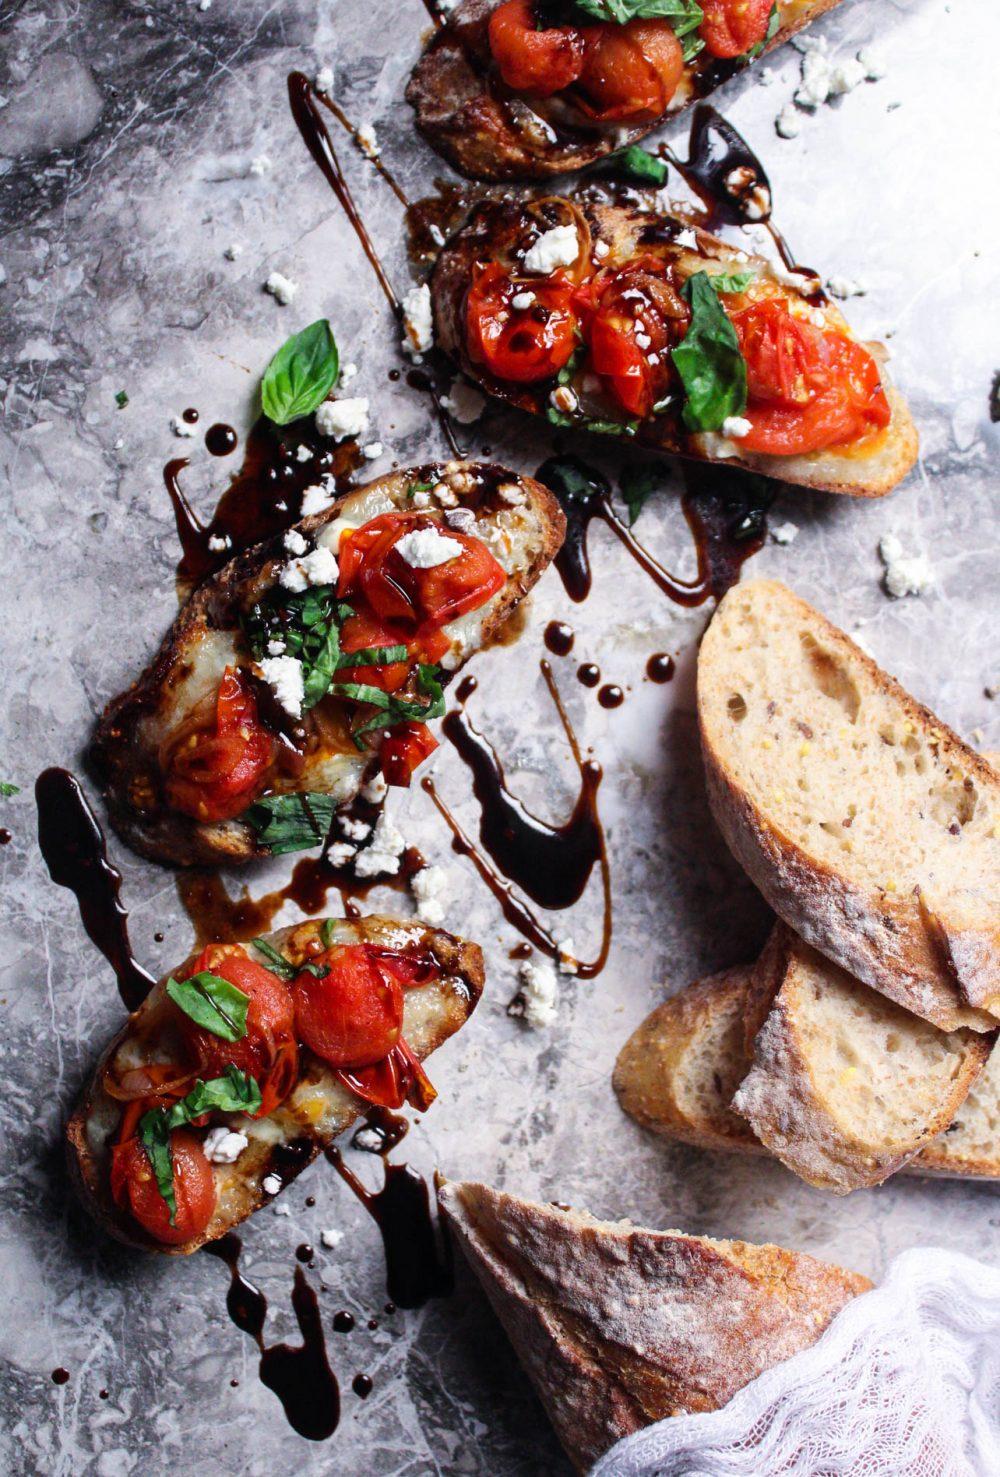 Blistered Tomato Crostini with Gorgonzola an Balsamic Glaze